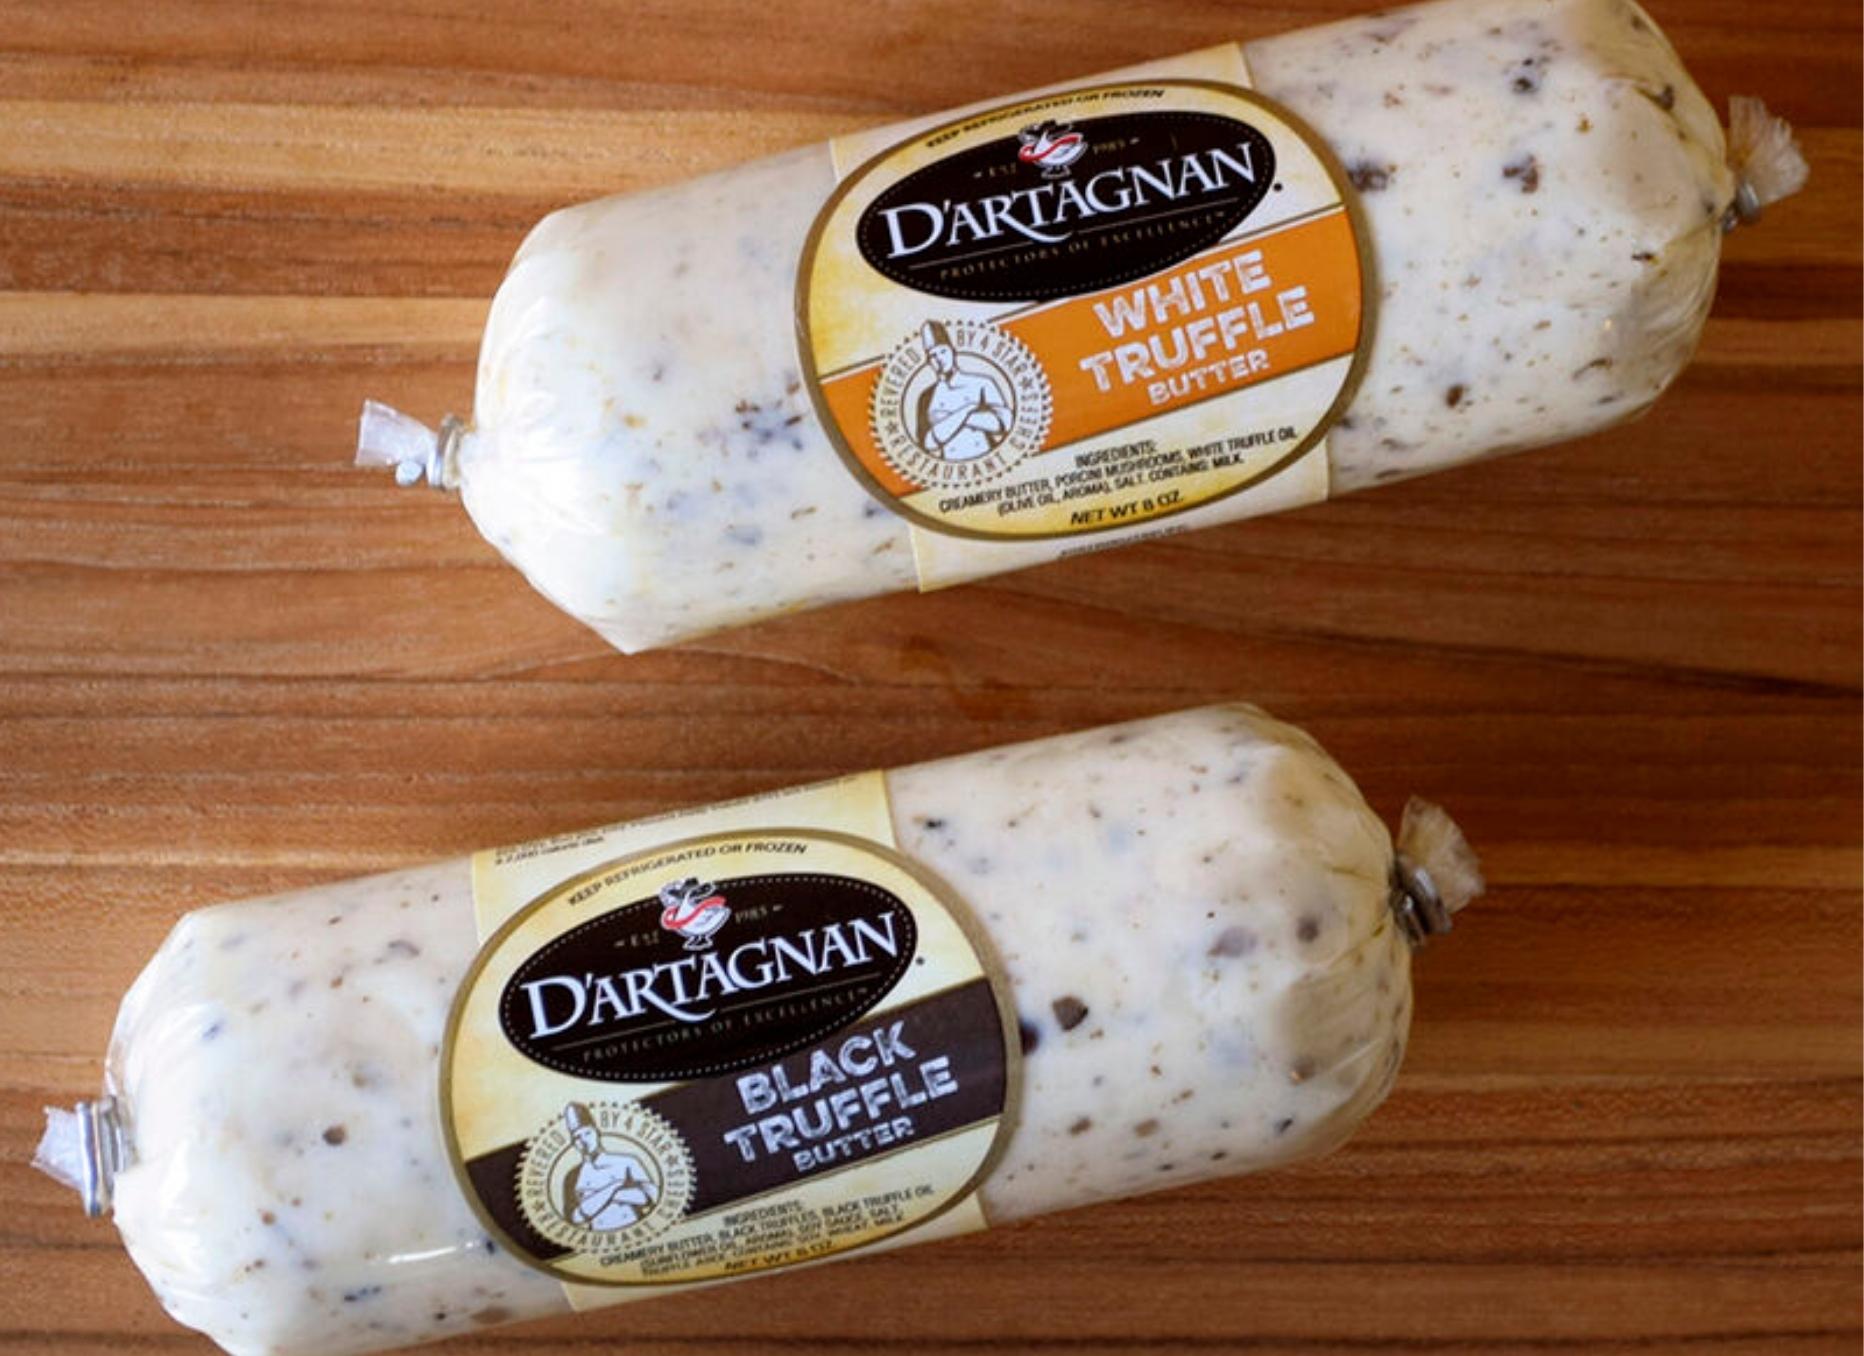 D'Artagnan Foods